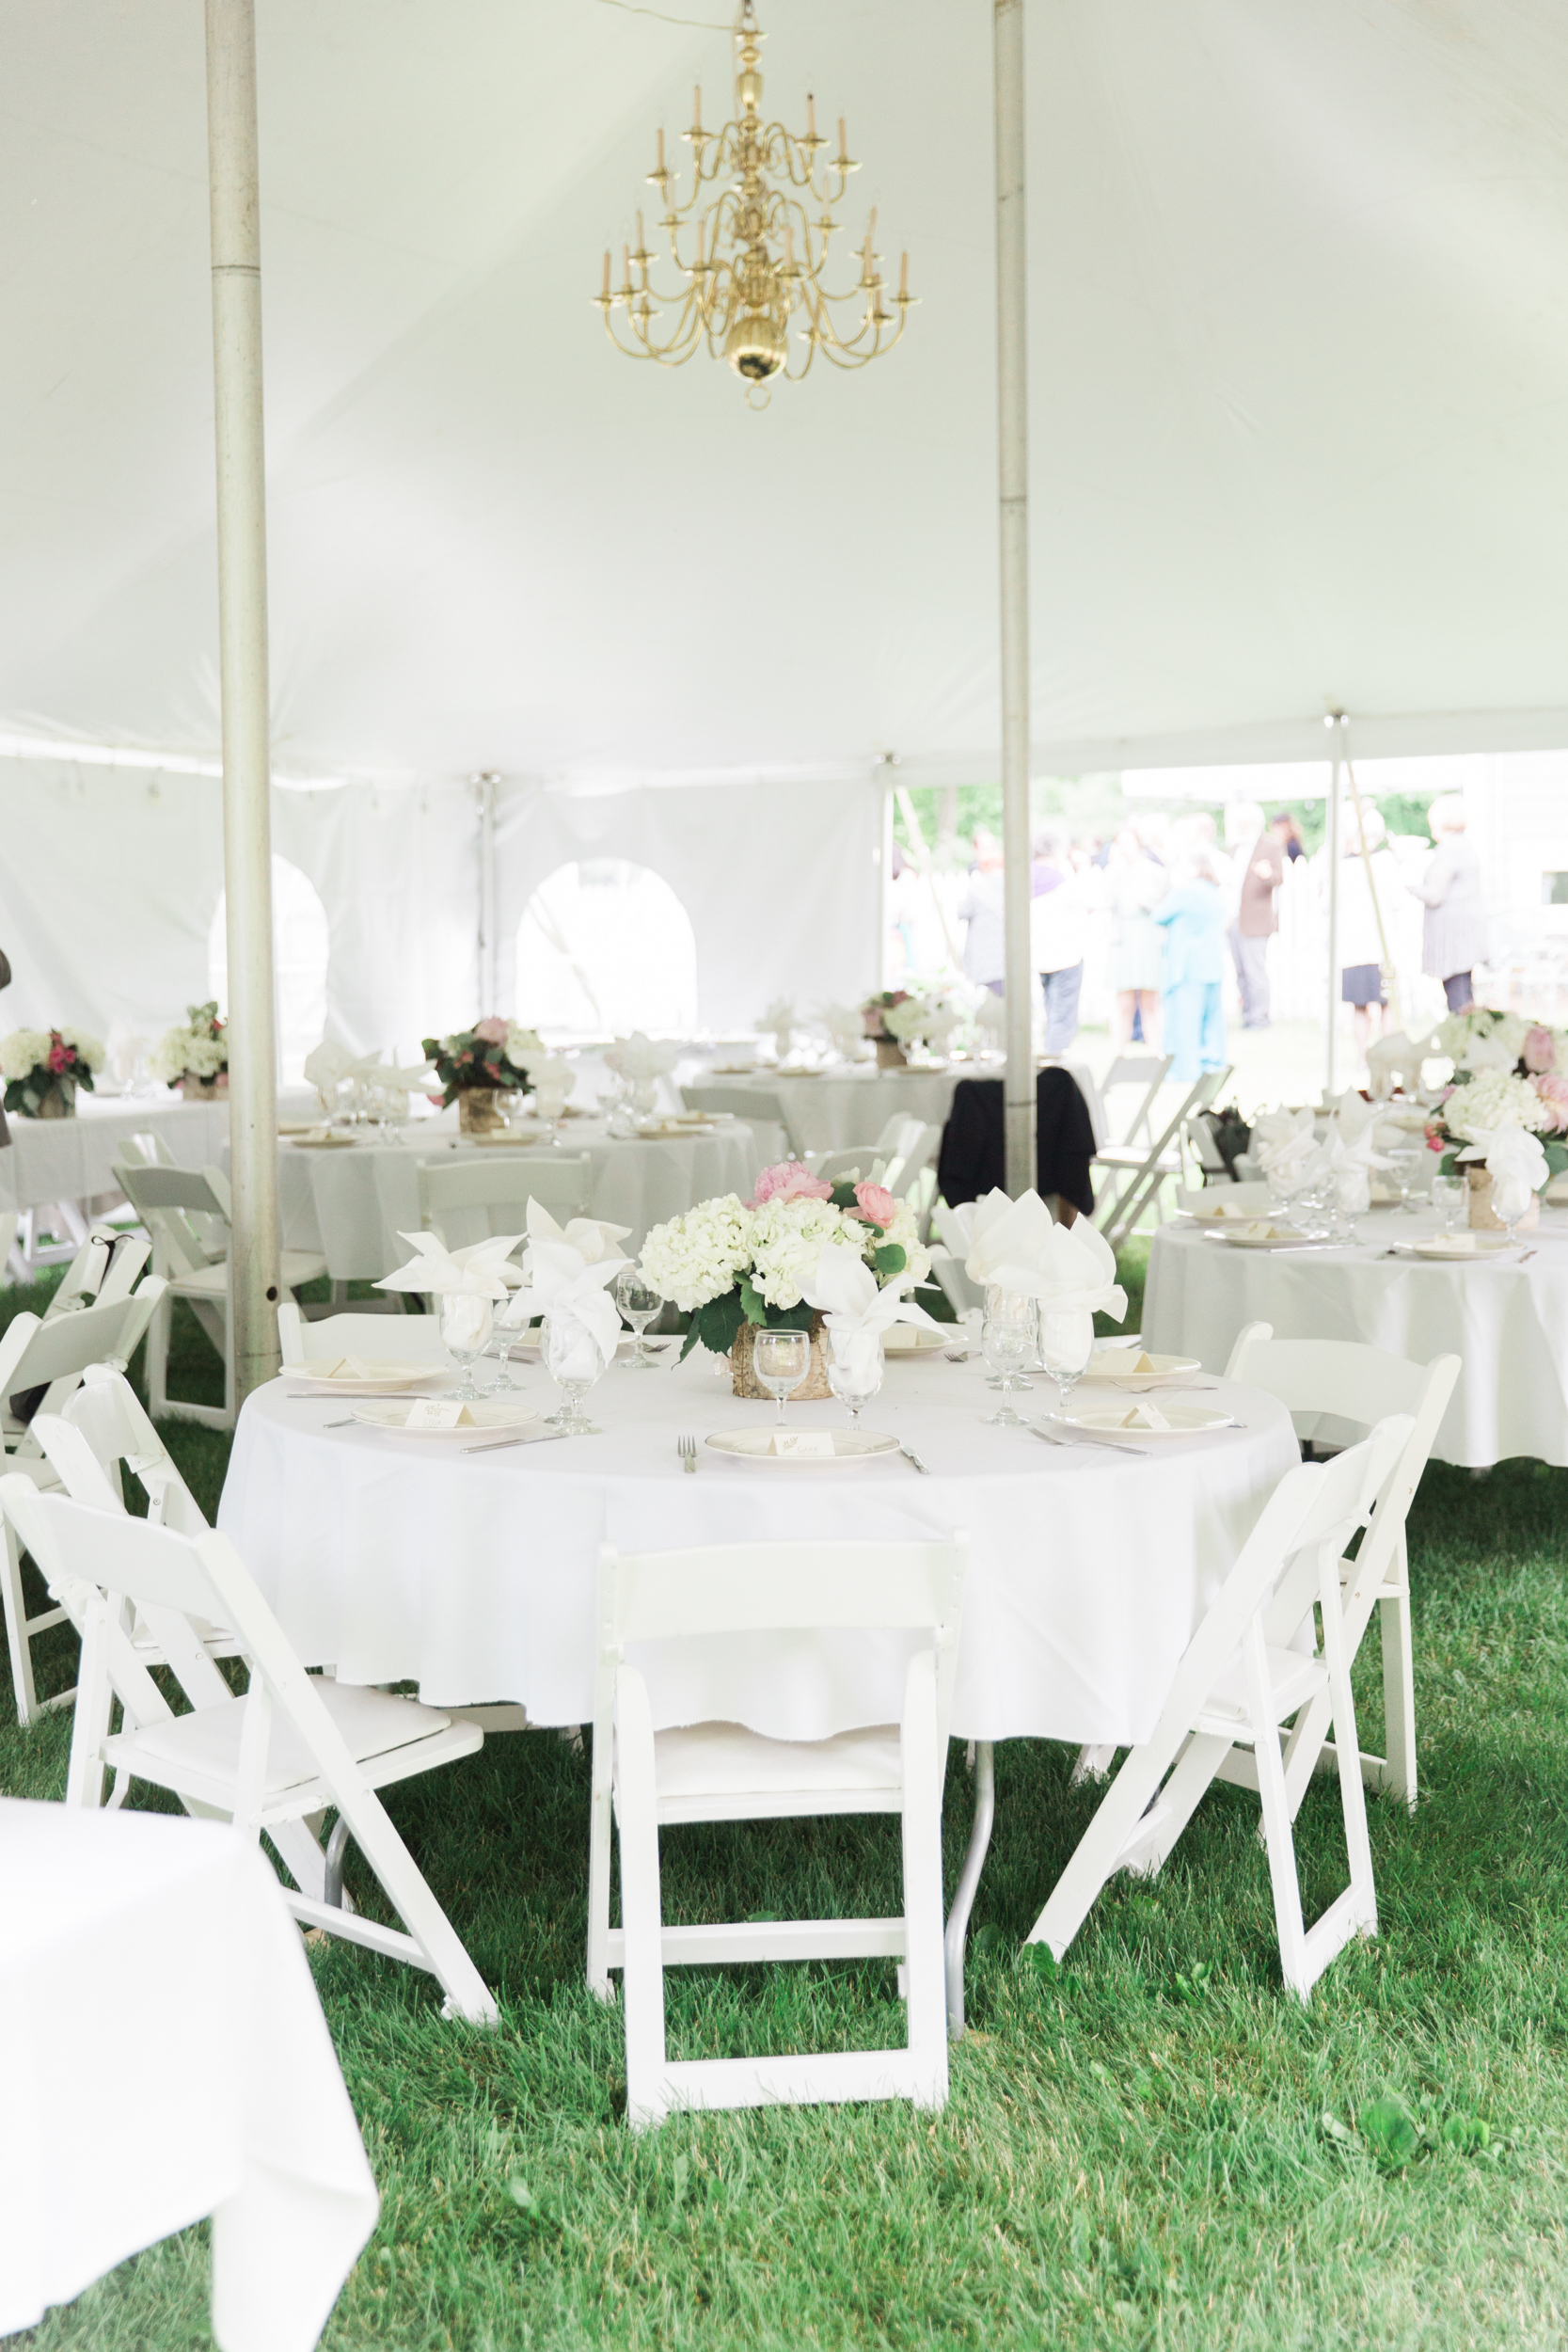 Tented Weddings in Massachsuetts